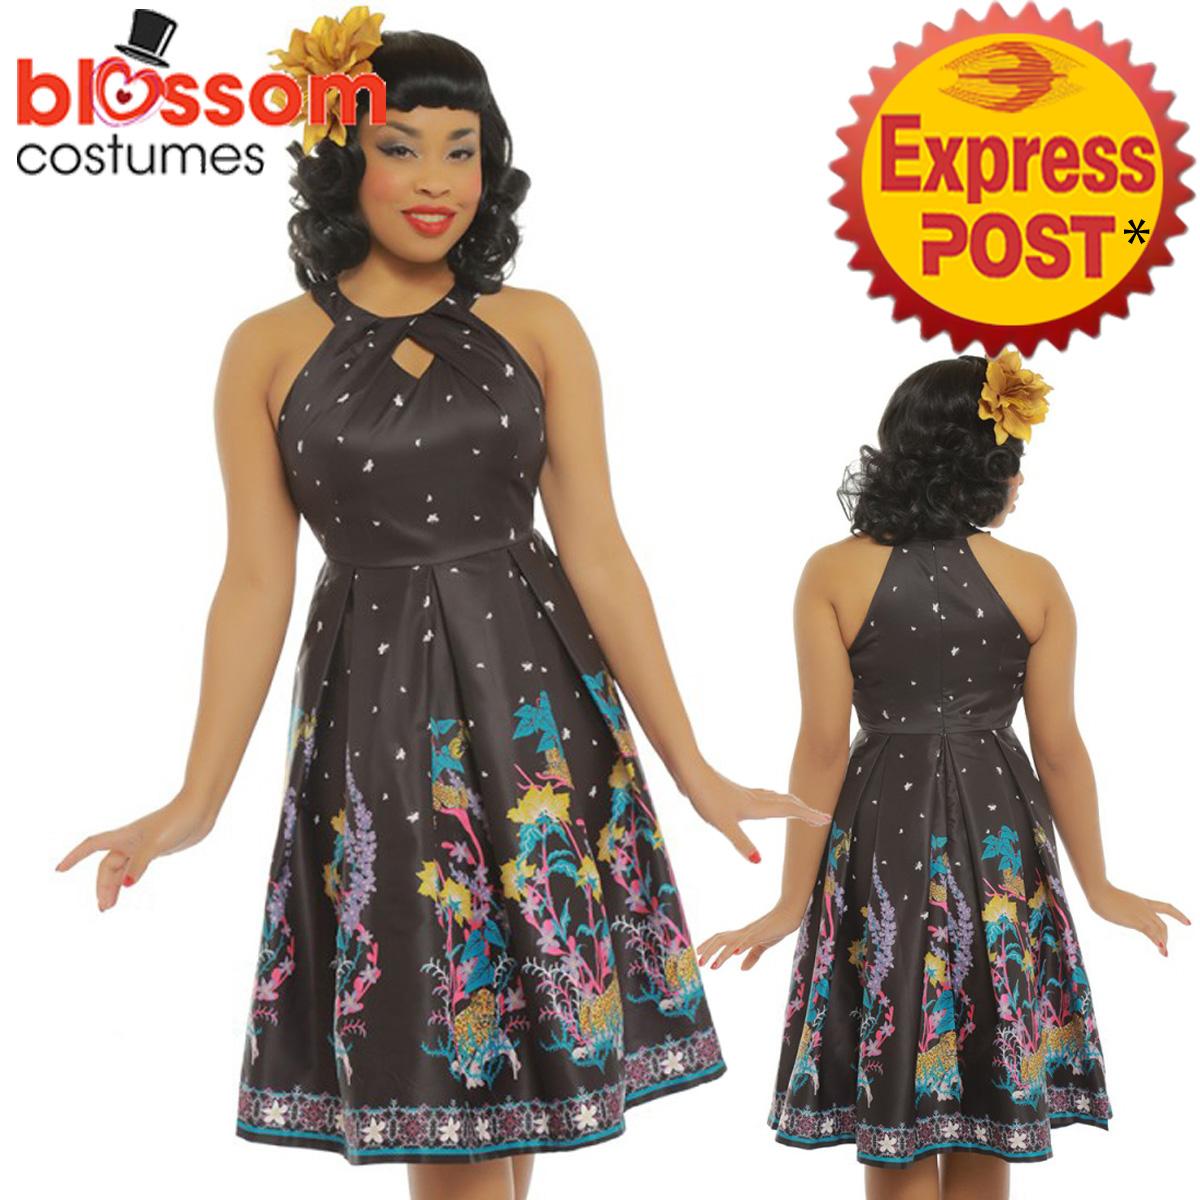 e791fd0b28f3 RKB55 Lindy Bop  Cheronda  Jaguar Print Swing Rockabilly 50s Swing Vintage  Dress 1 of 5Only 2 available ...